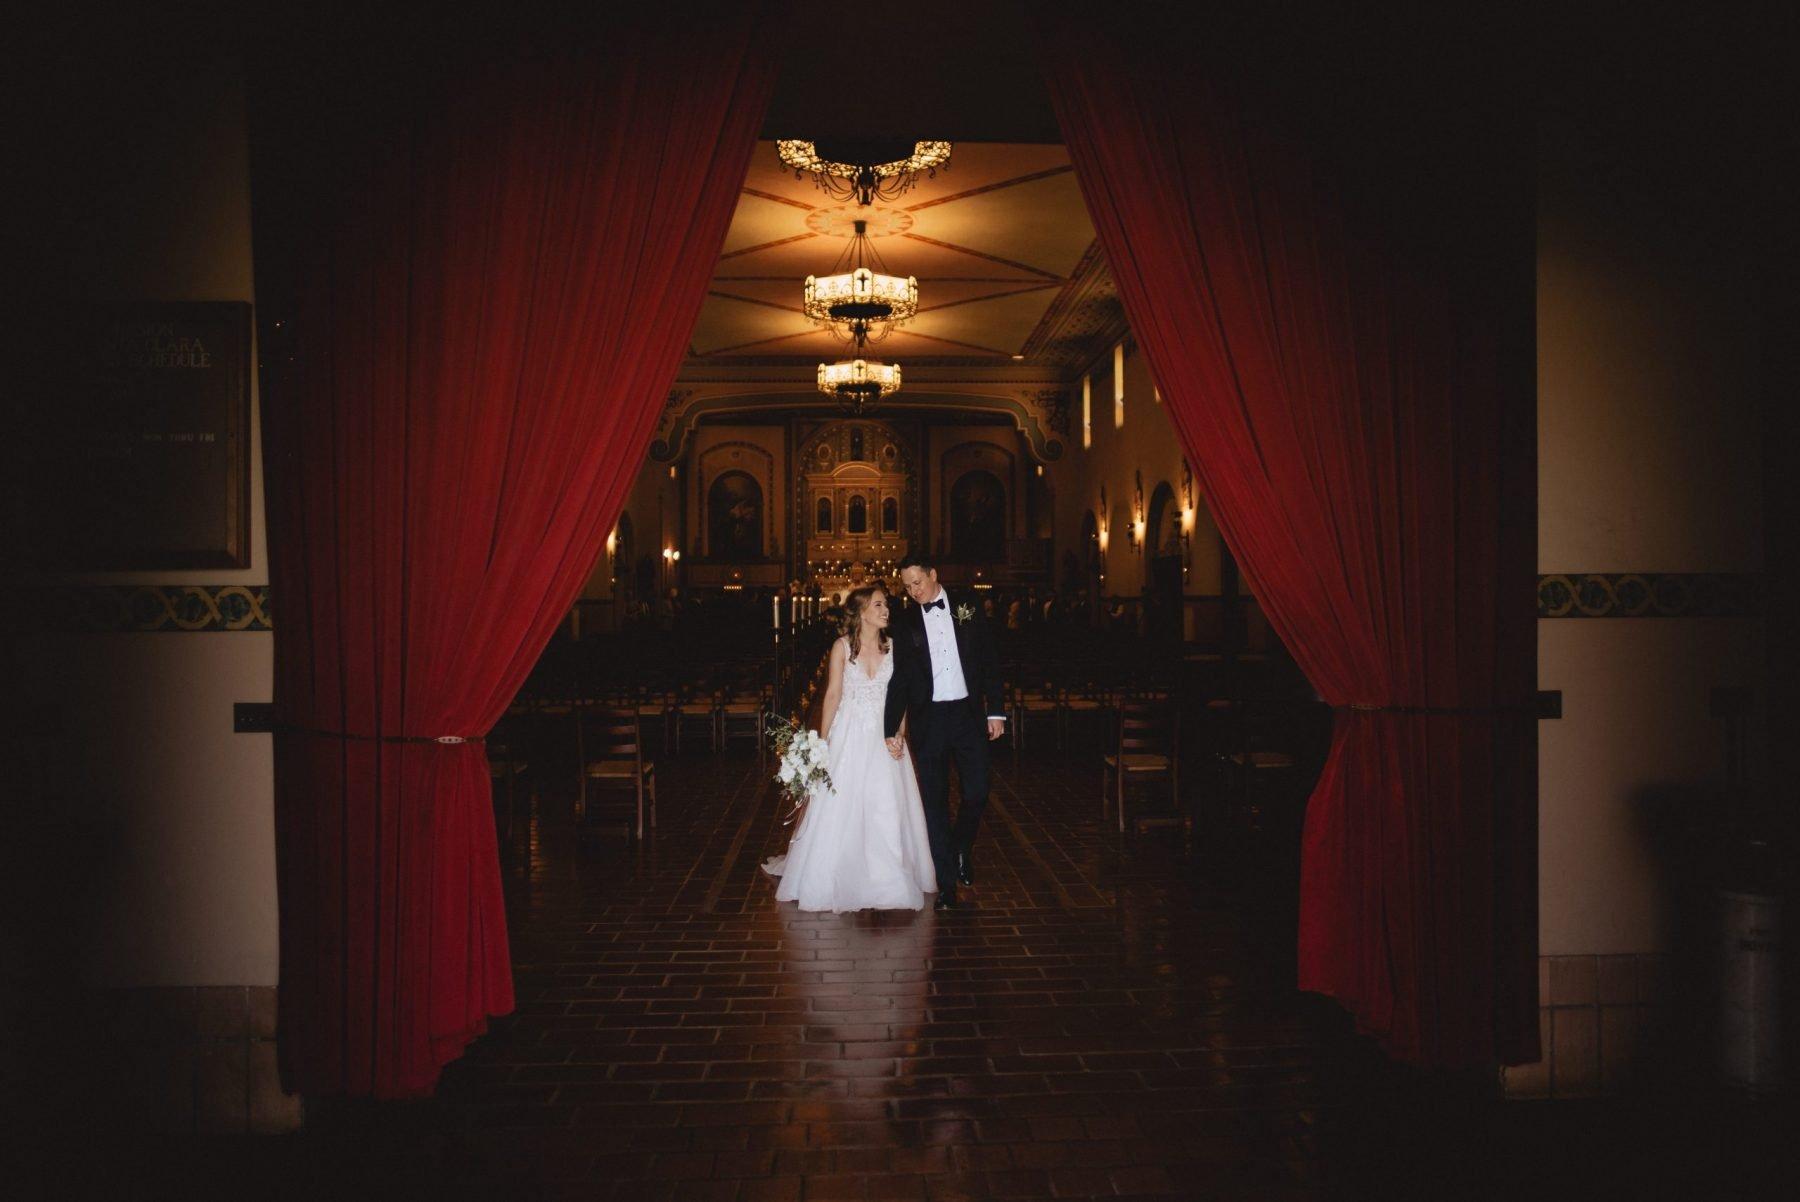 san francisco wedding photographer candid moody photos